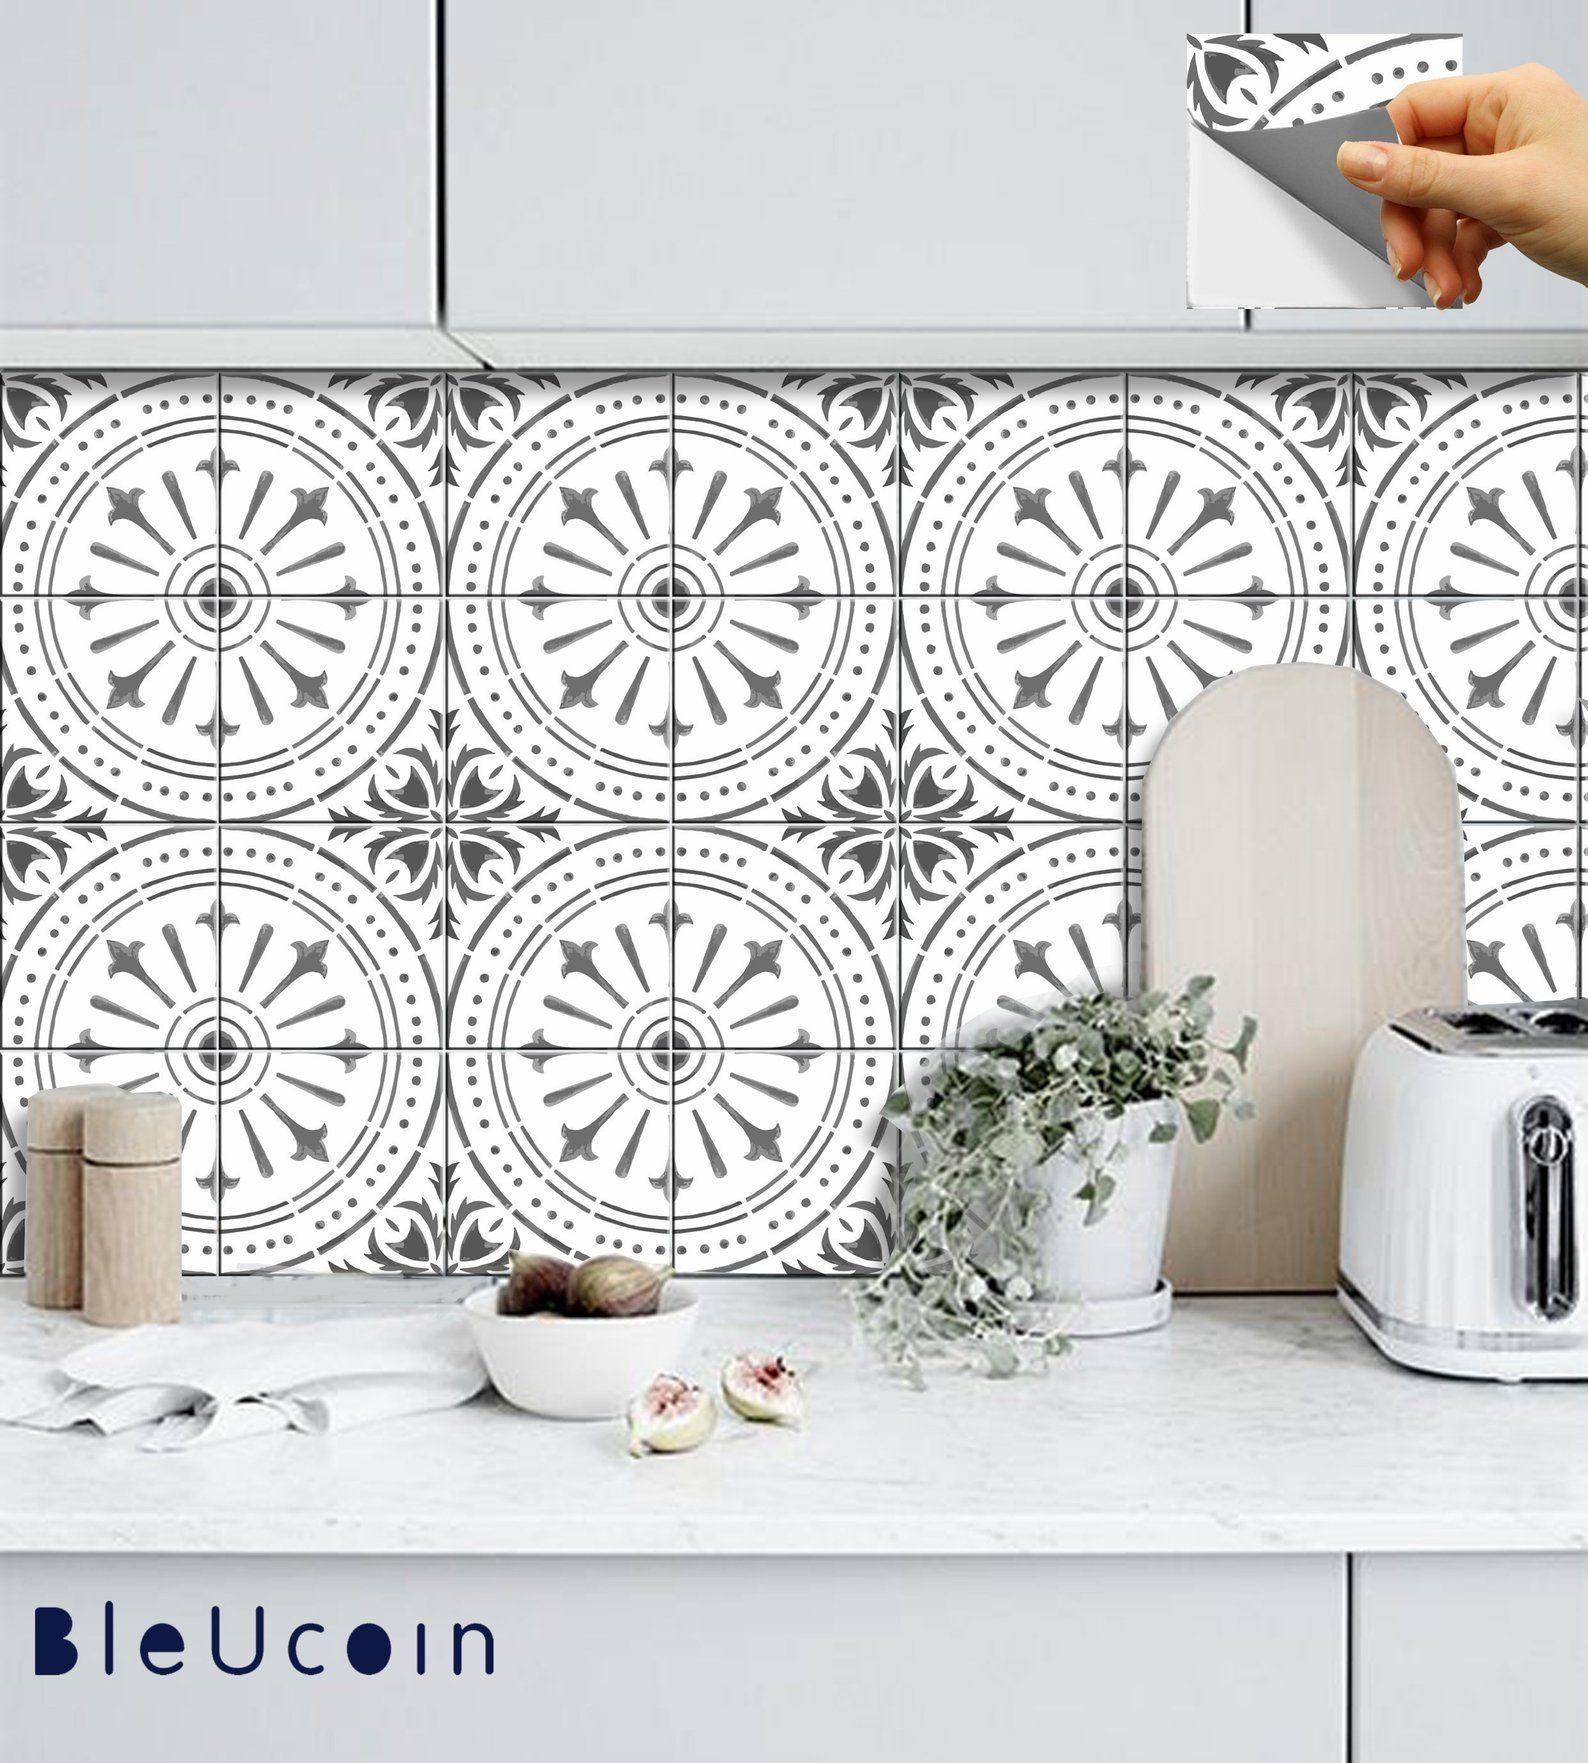 Naples Tile Wall Stair Floor Self Adhesive Vinyl Stickers Kitchen Bathroom Backsplash Carrelage Decal Peel Stick Home Decor Flooring For Stairs Peel And Stick Floor Stick On Tiles